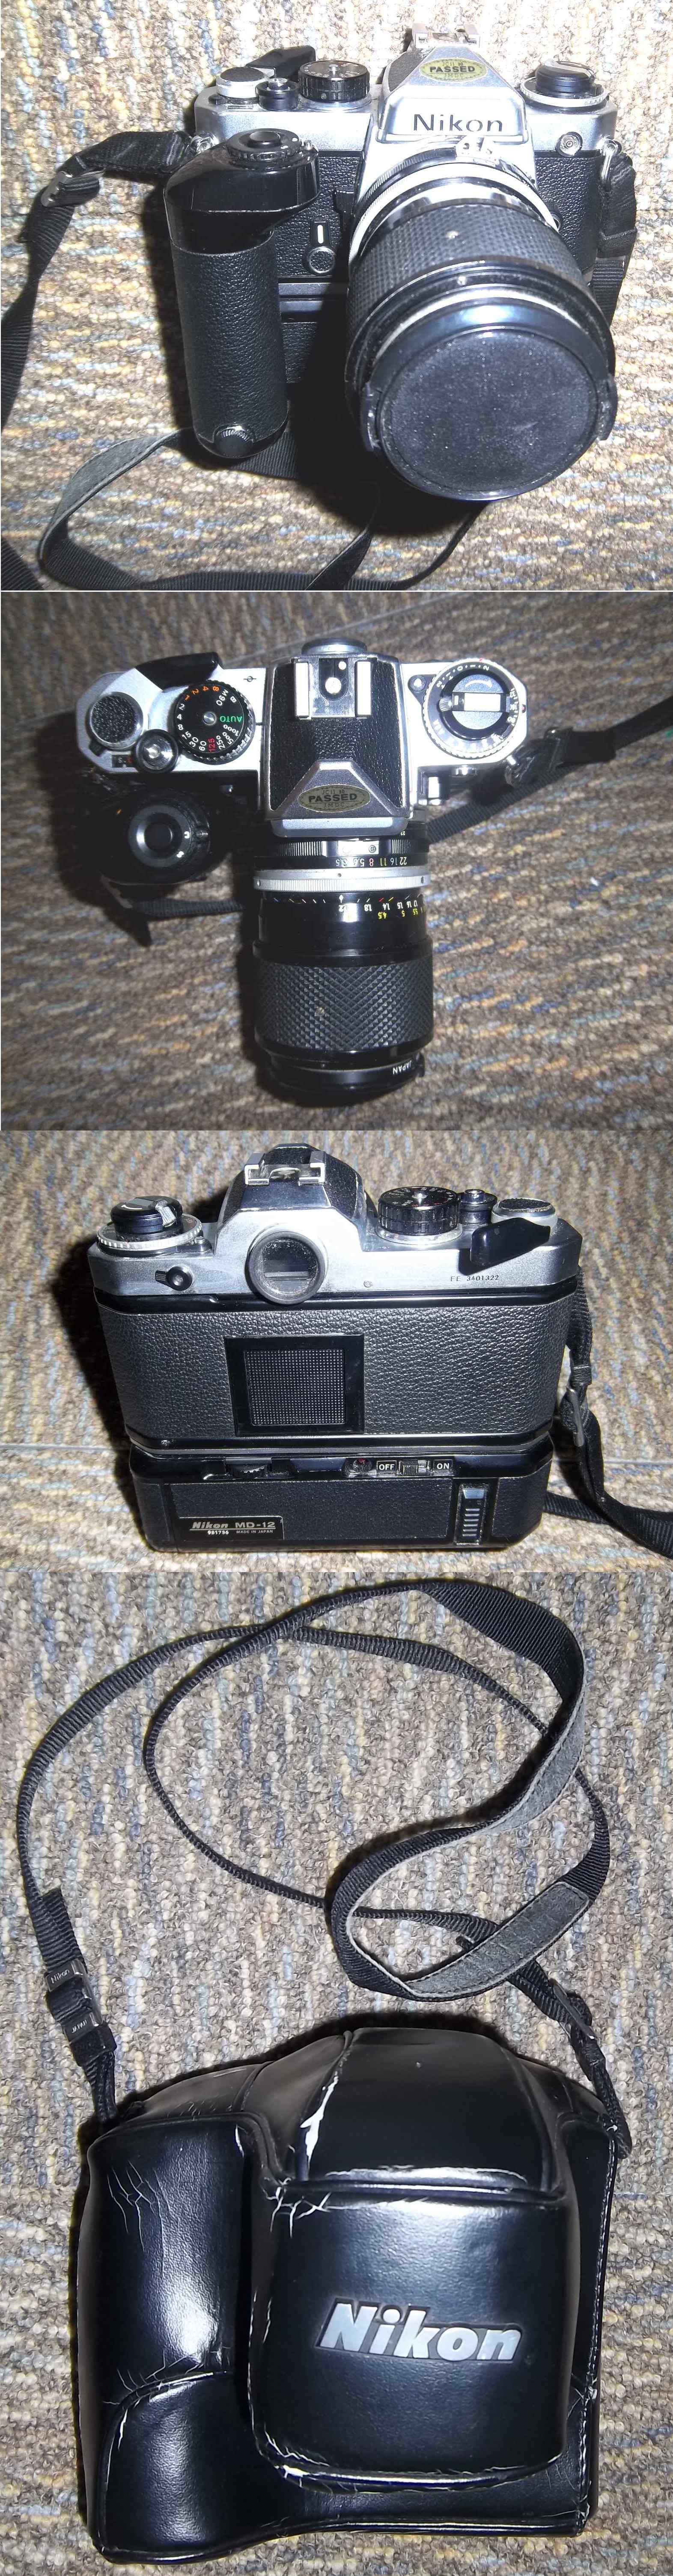 Nikon FM-2 MD12 Motor Drive SB15 Flash / Tele Lens cameras